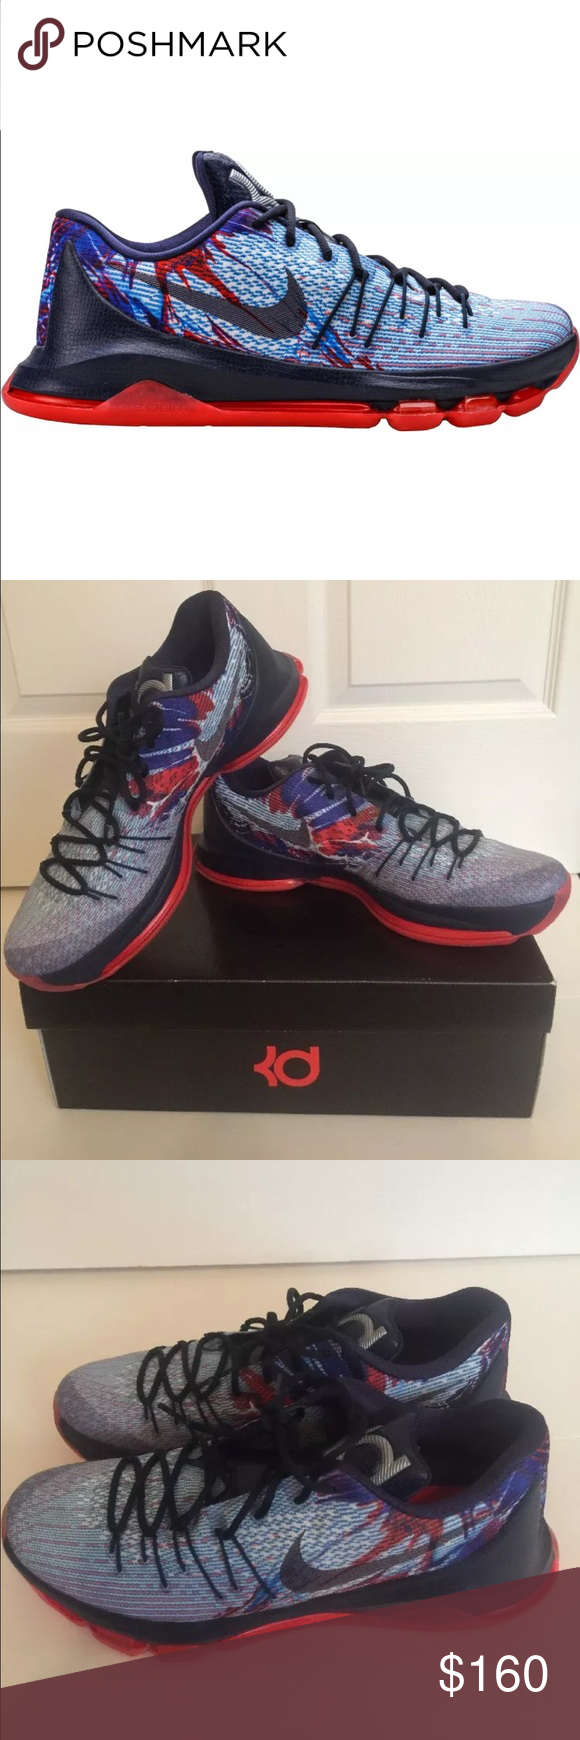 brand new 60f21 9b902 New Nike KD 8 USA Mid US Size 13 The Nike KD 8 Mens Basketball Shoe